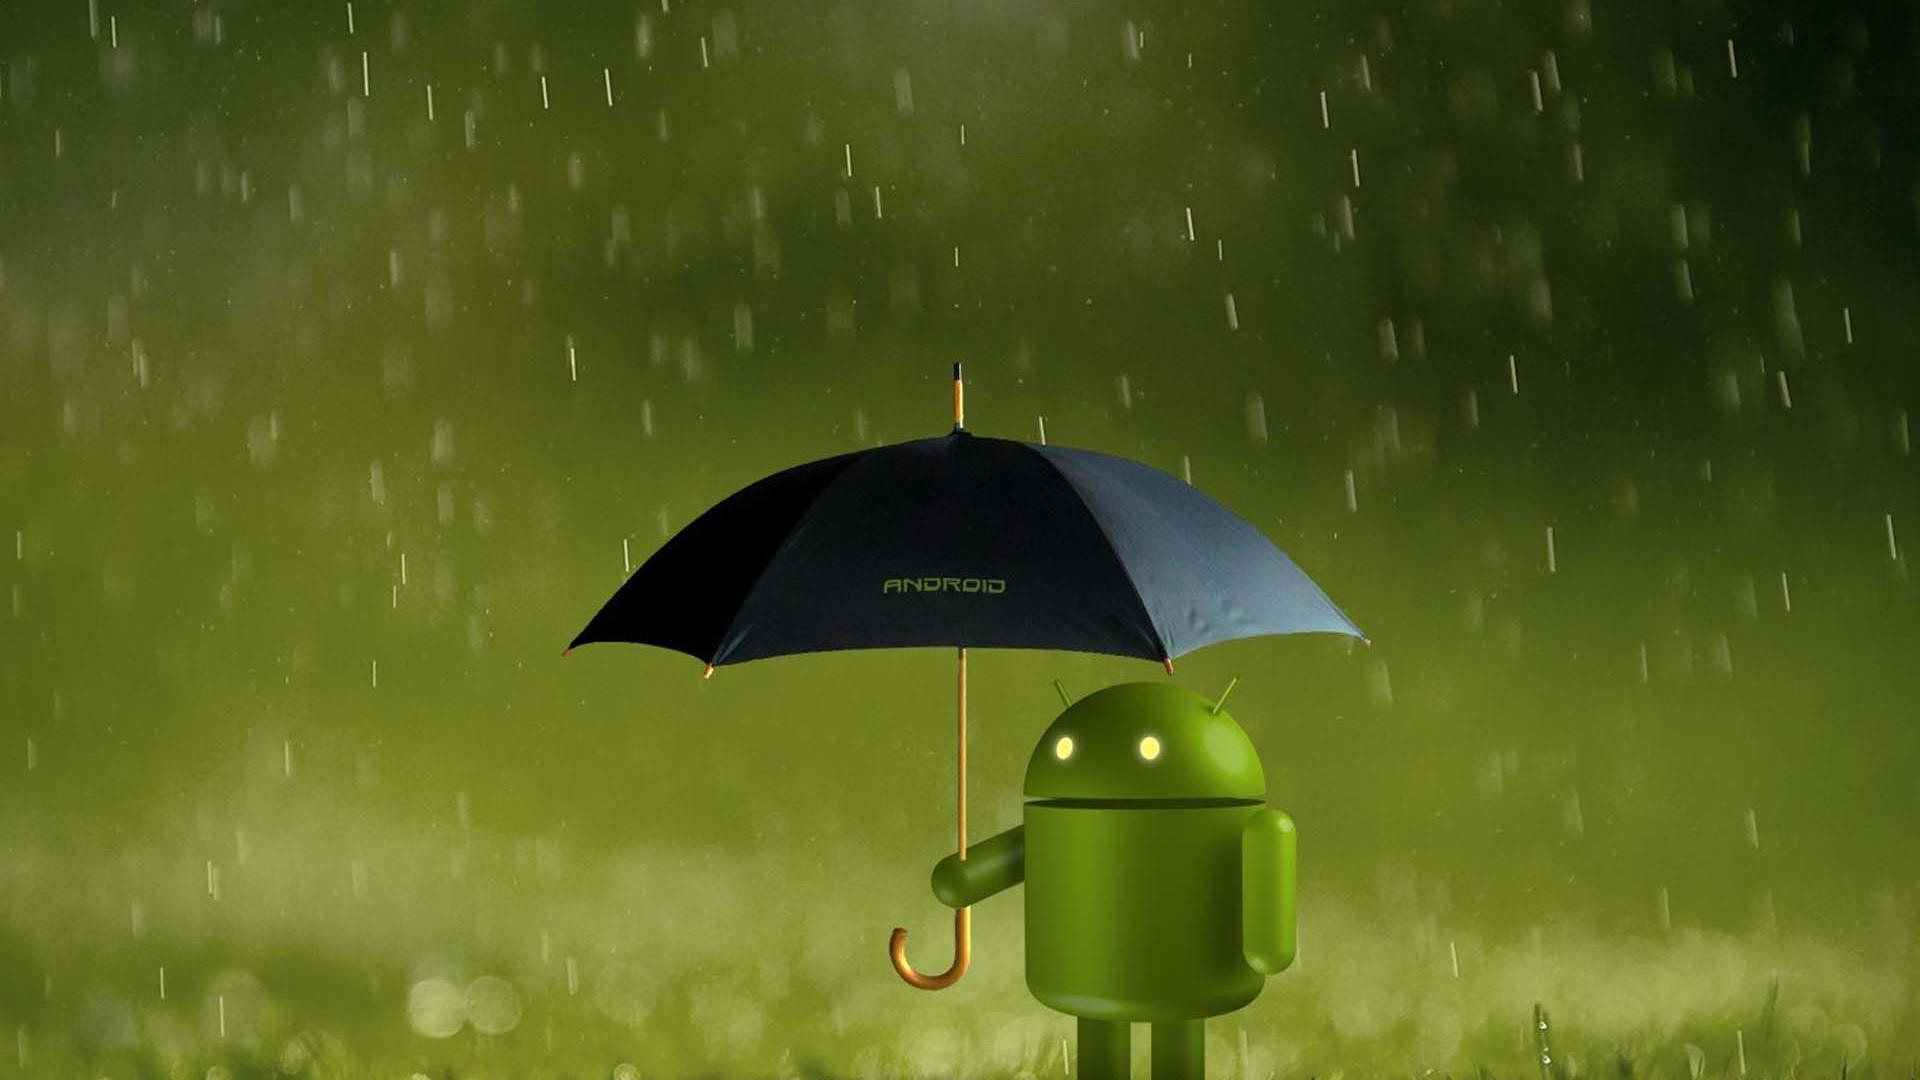 3d Live Wallpaper For Android Tablet Free Download Live Wallpaper For Pc Pixelstalk Net